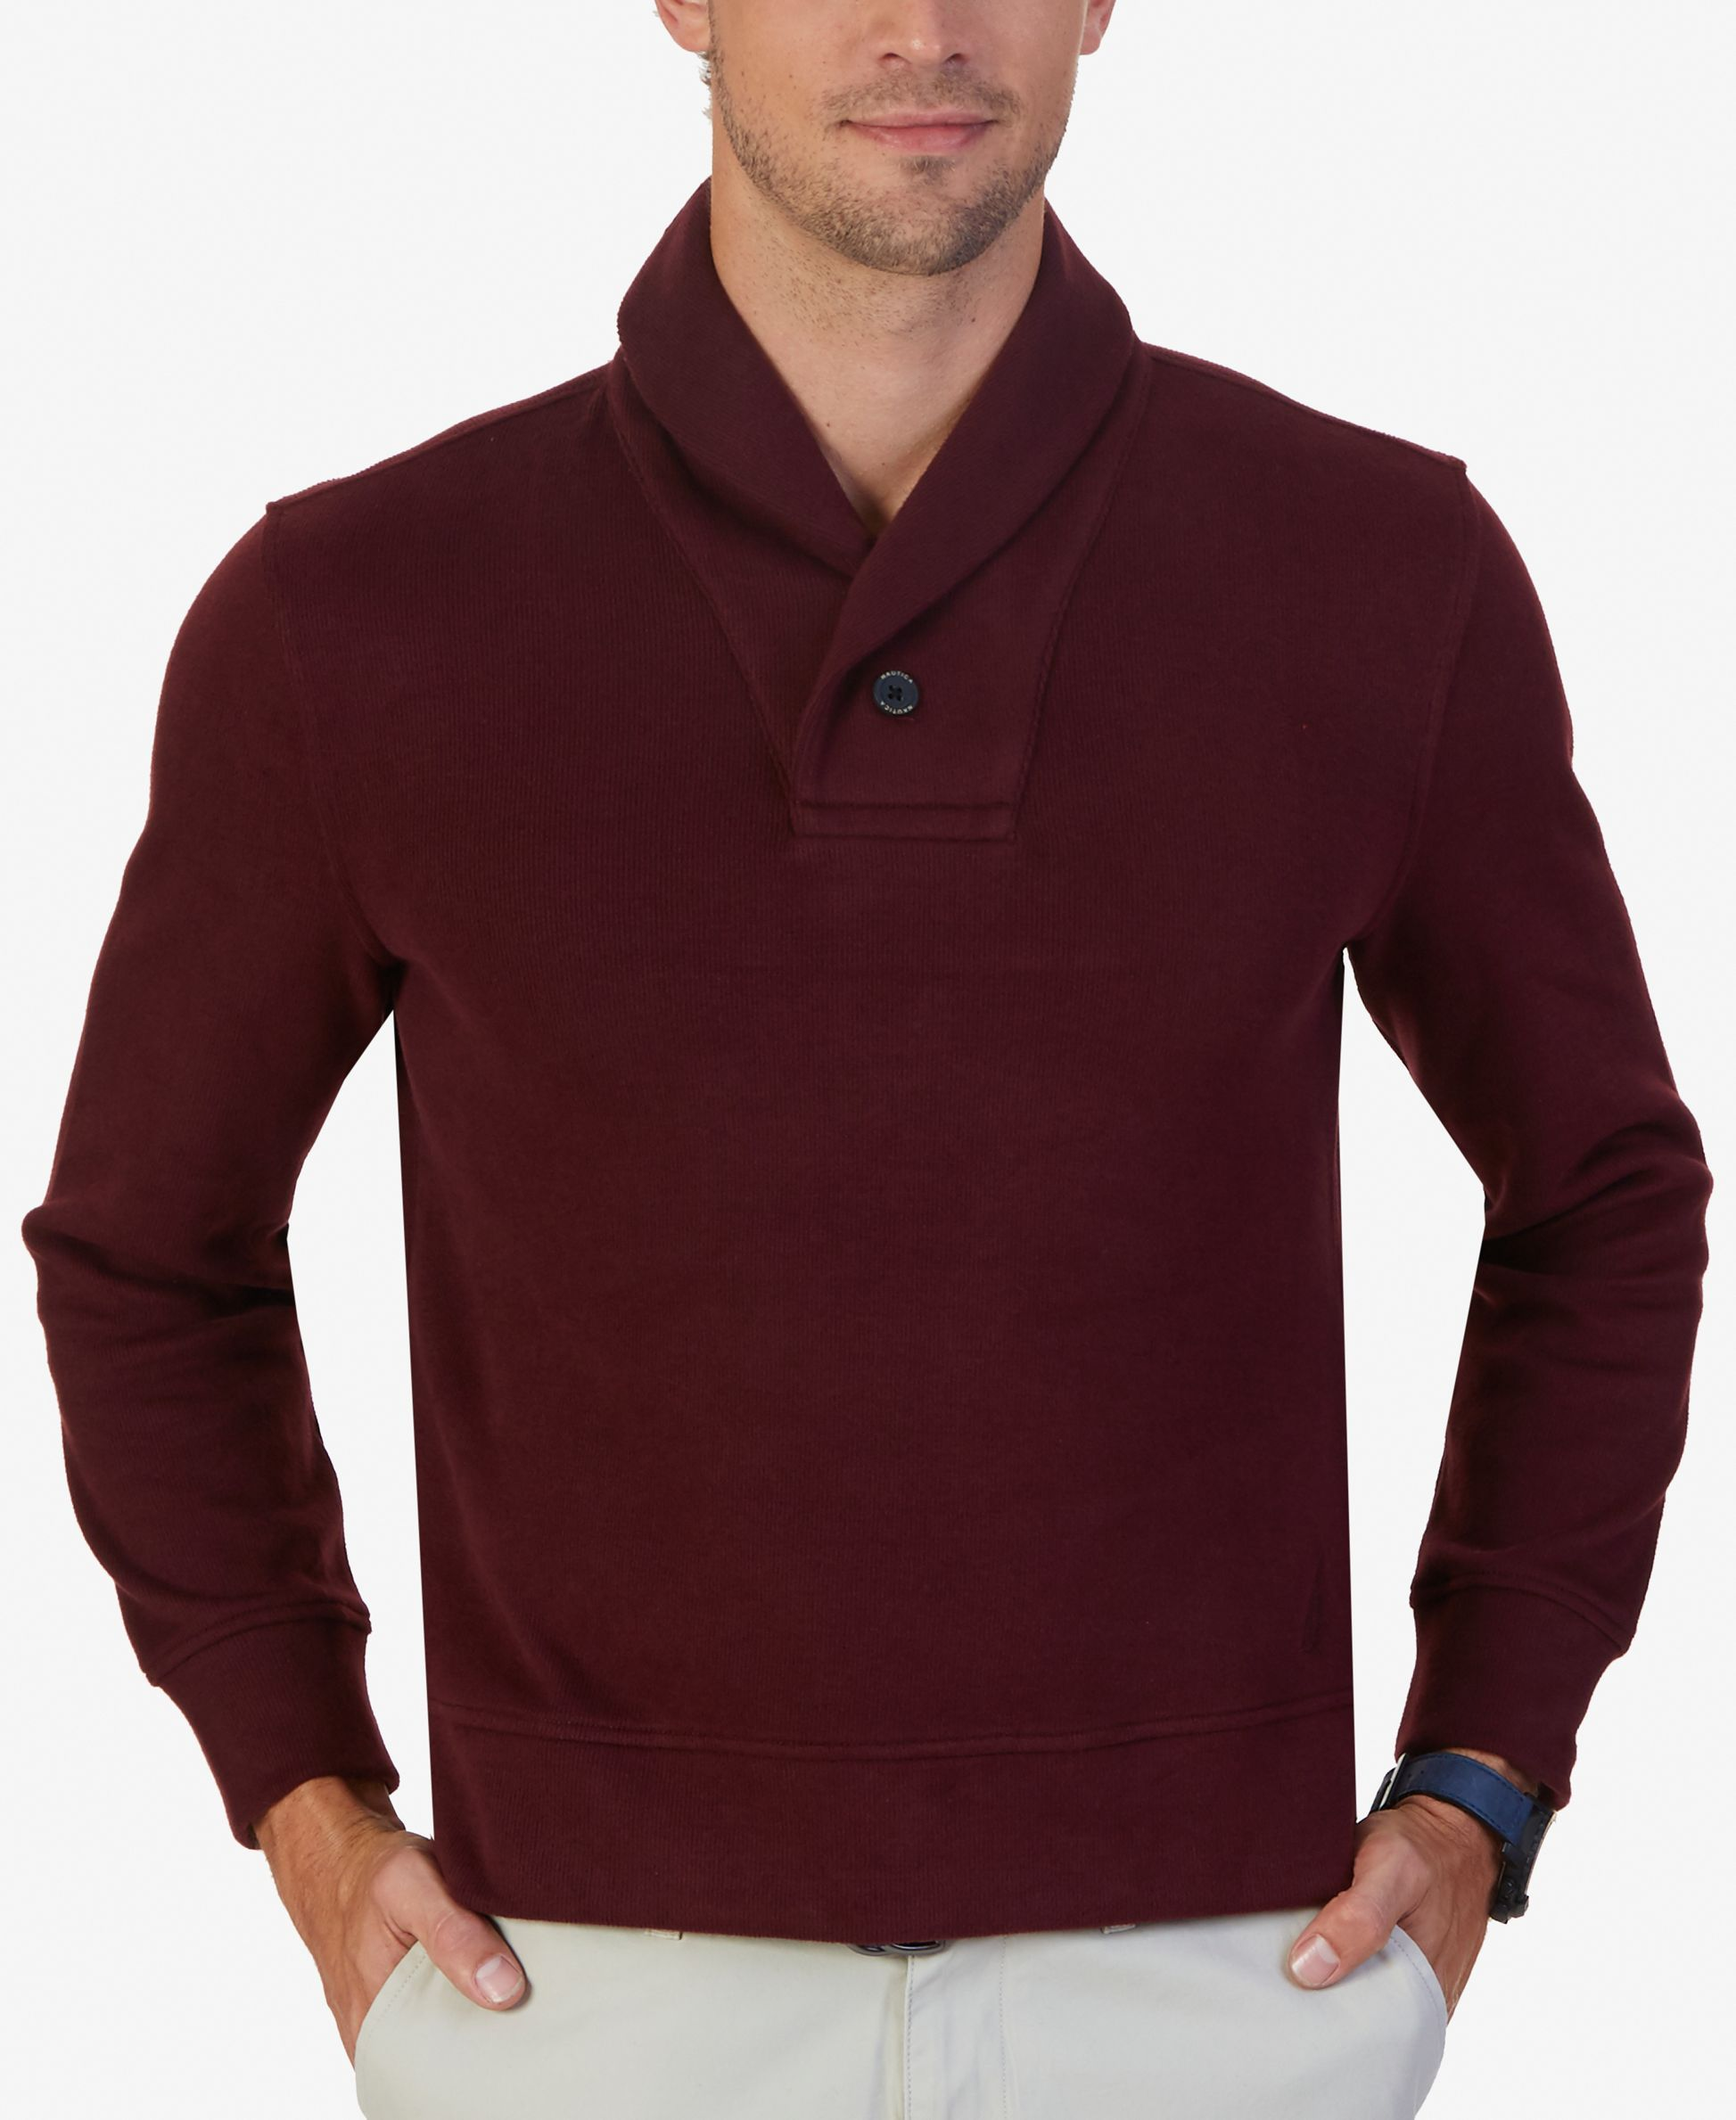 Nautica Men's Shawl-Collar Sweater   Shawl collar sweater and Products